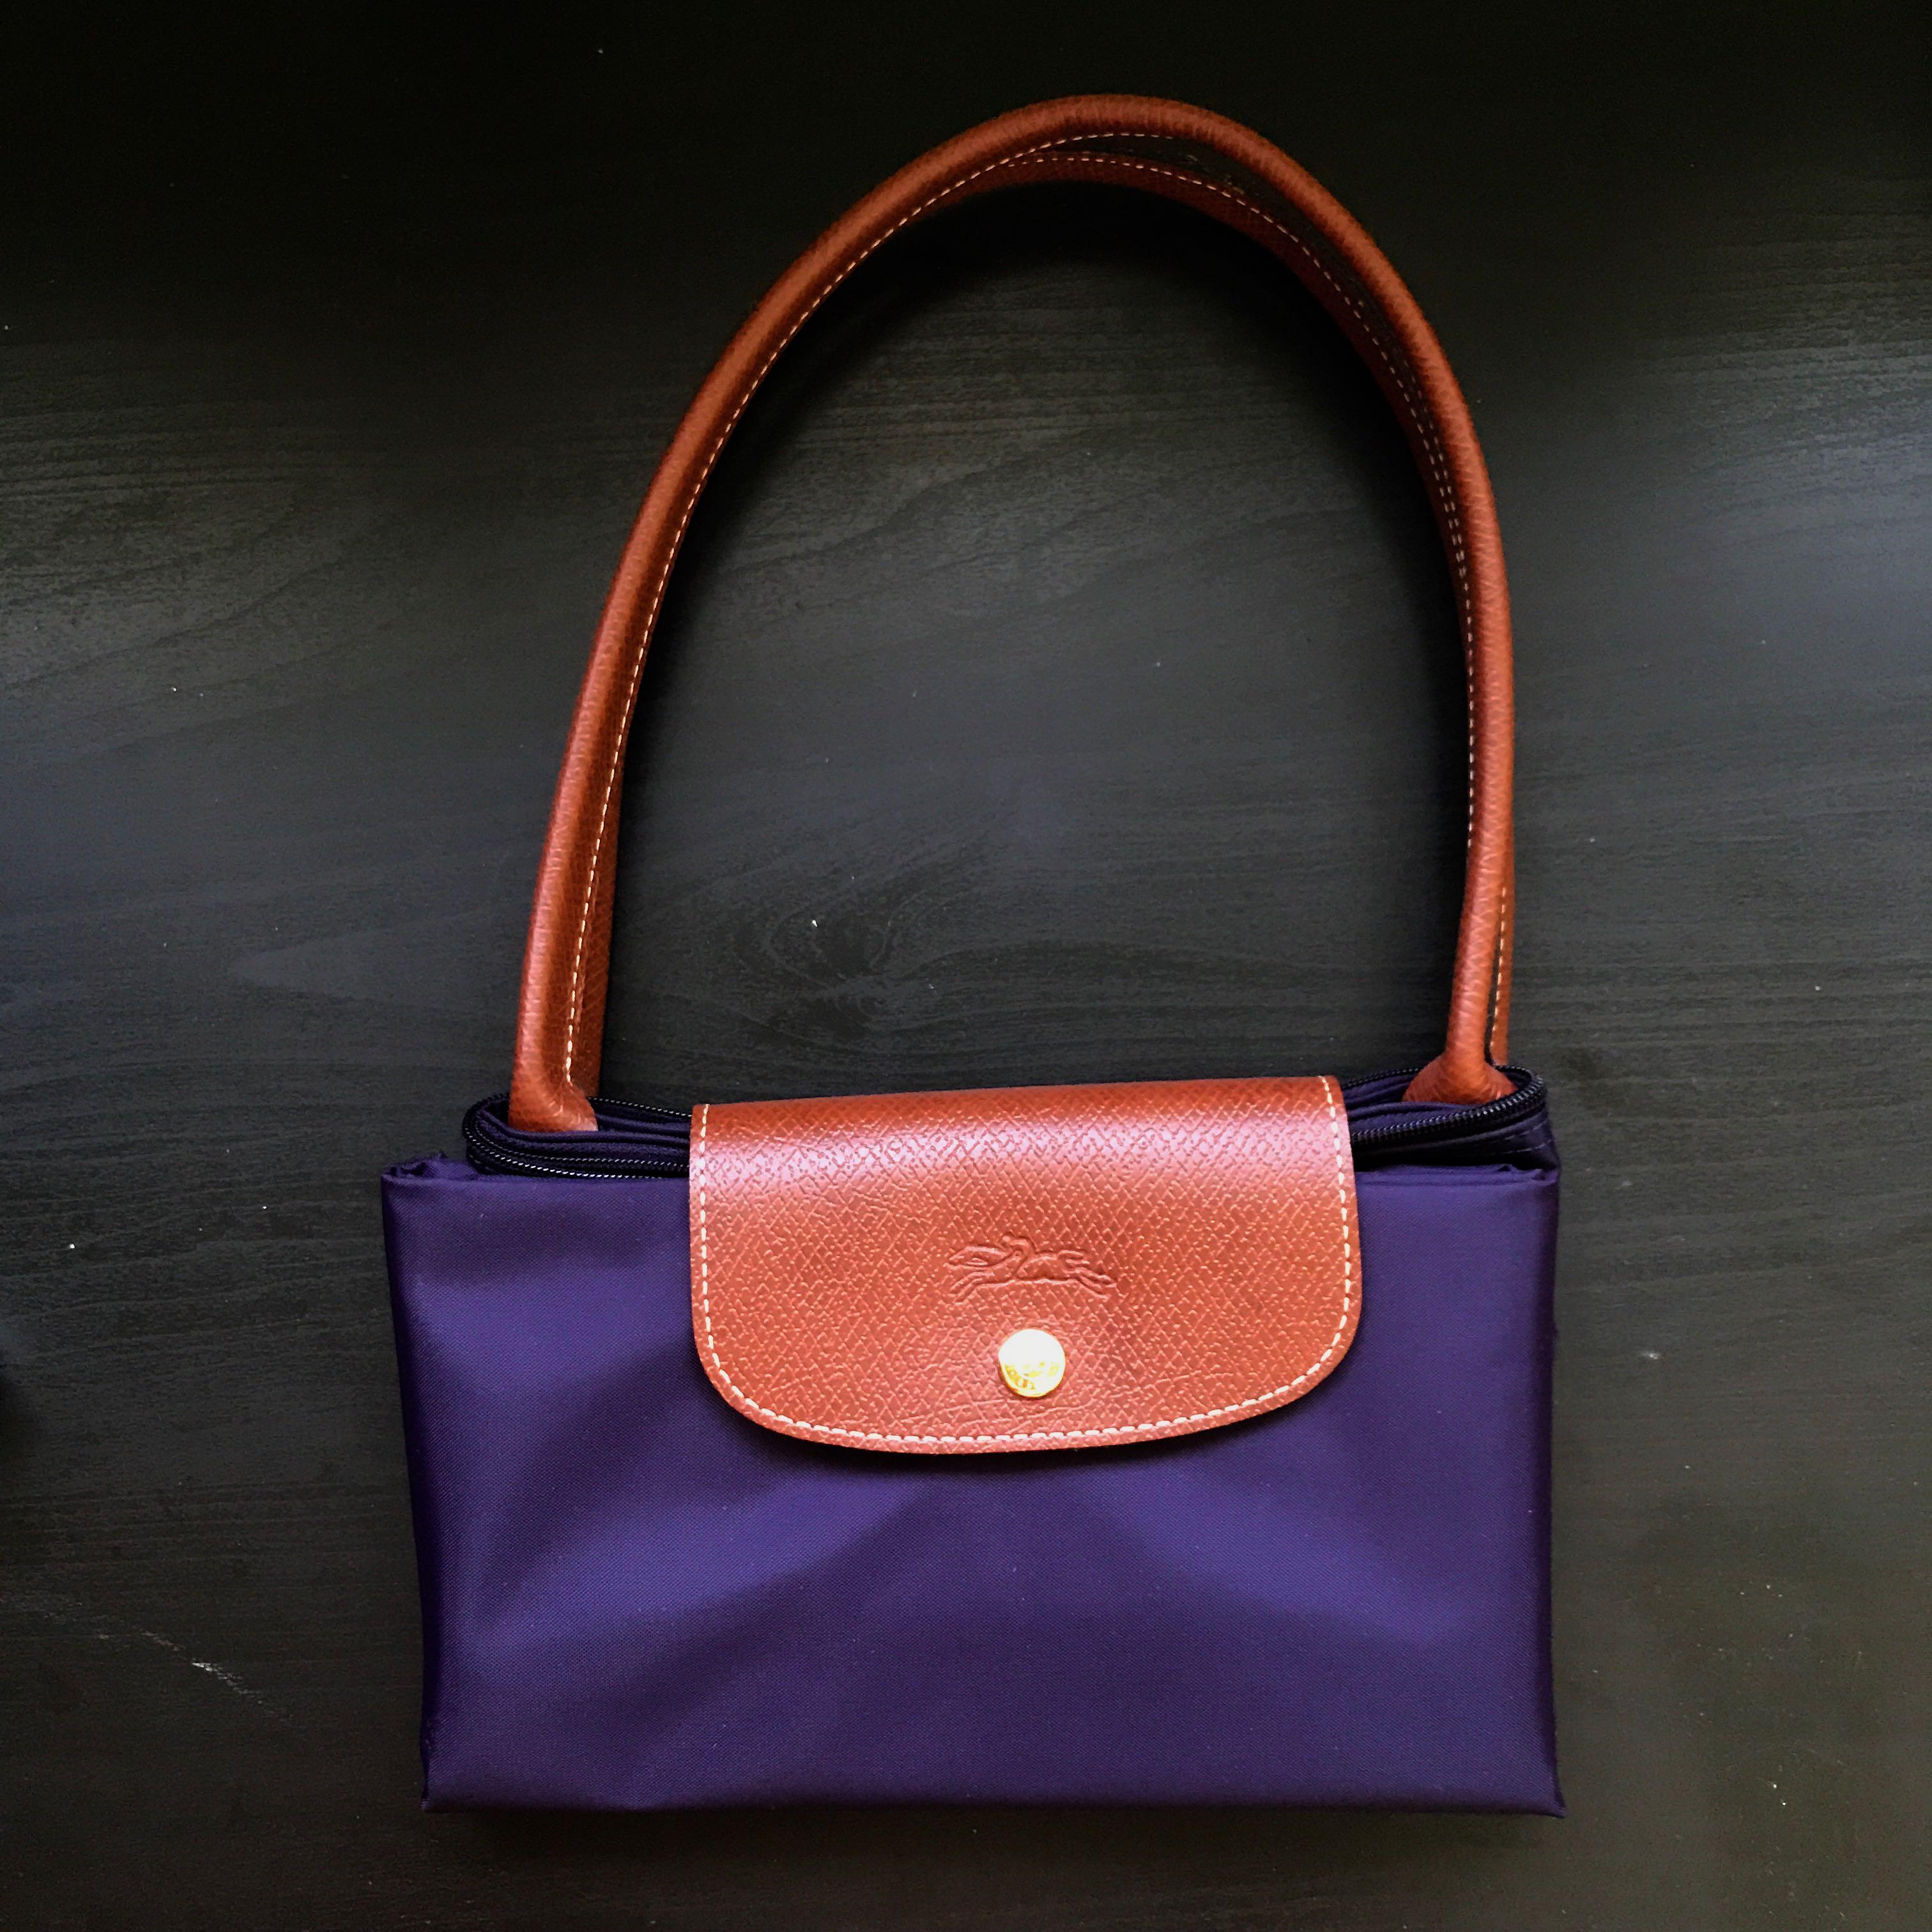 8f69ee67eb5fb Home · Women s Fashion · Bags   Wallets · Handbags. photo photo photo photo